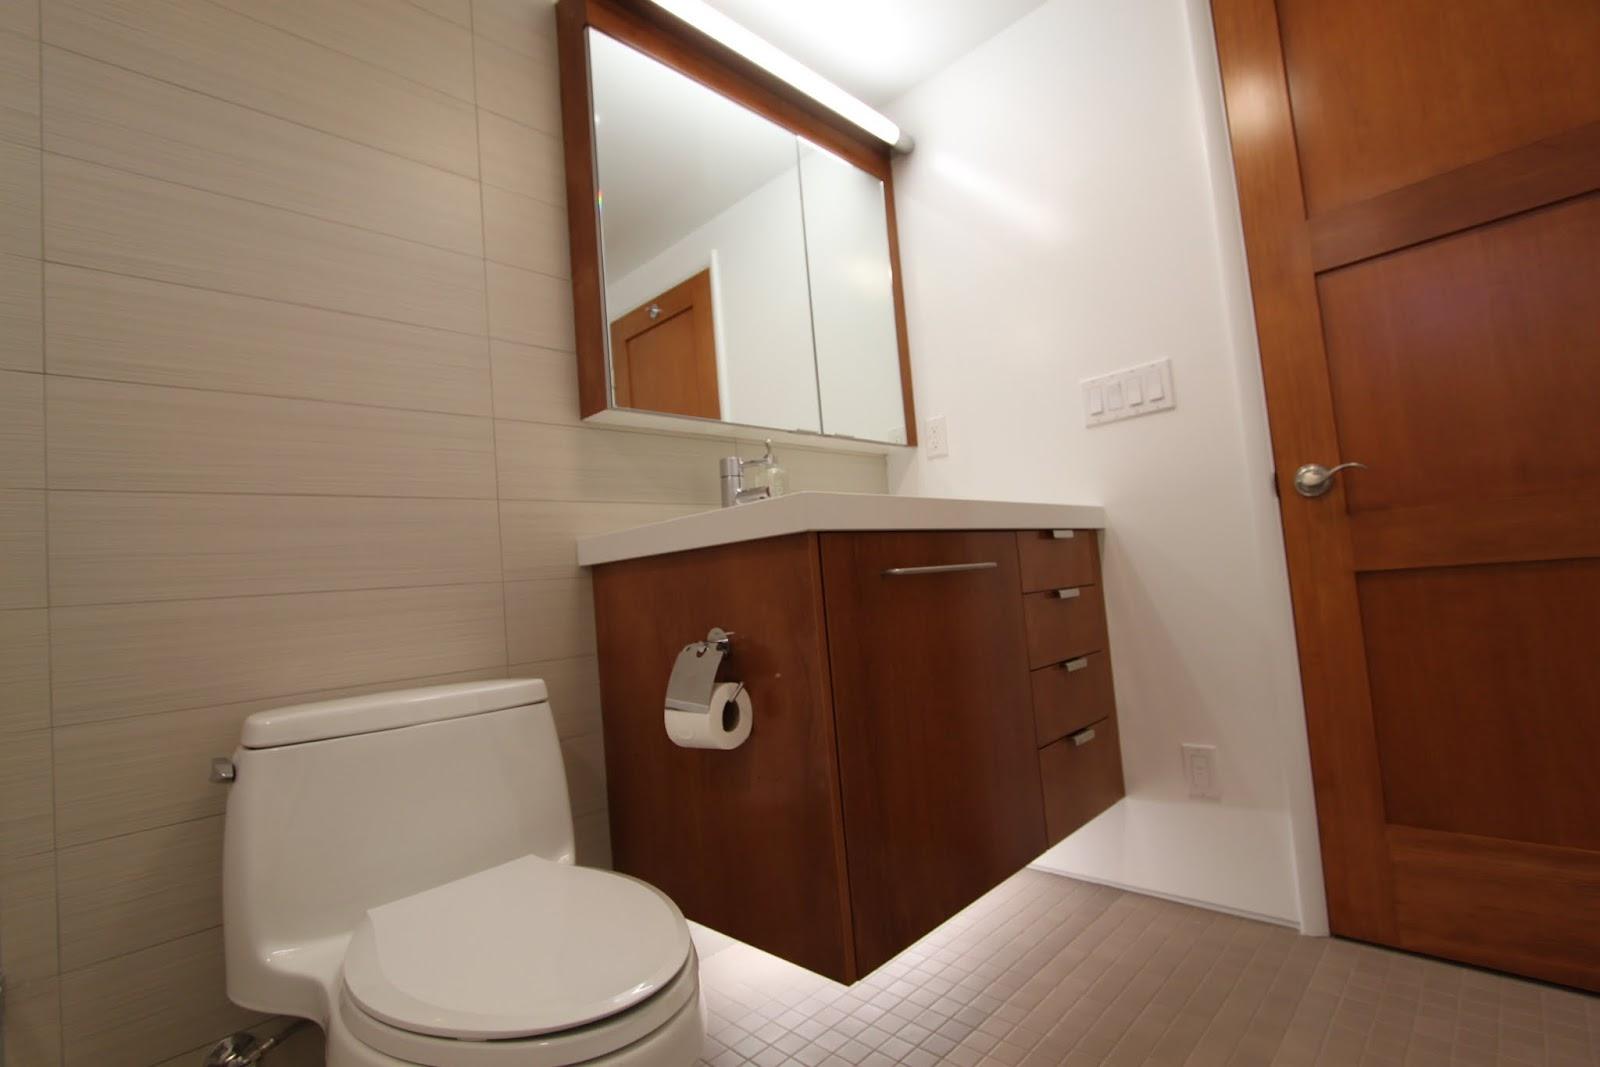 Top five favorite features mid century bathroom remodel for Best bathroom features